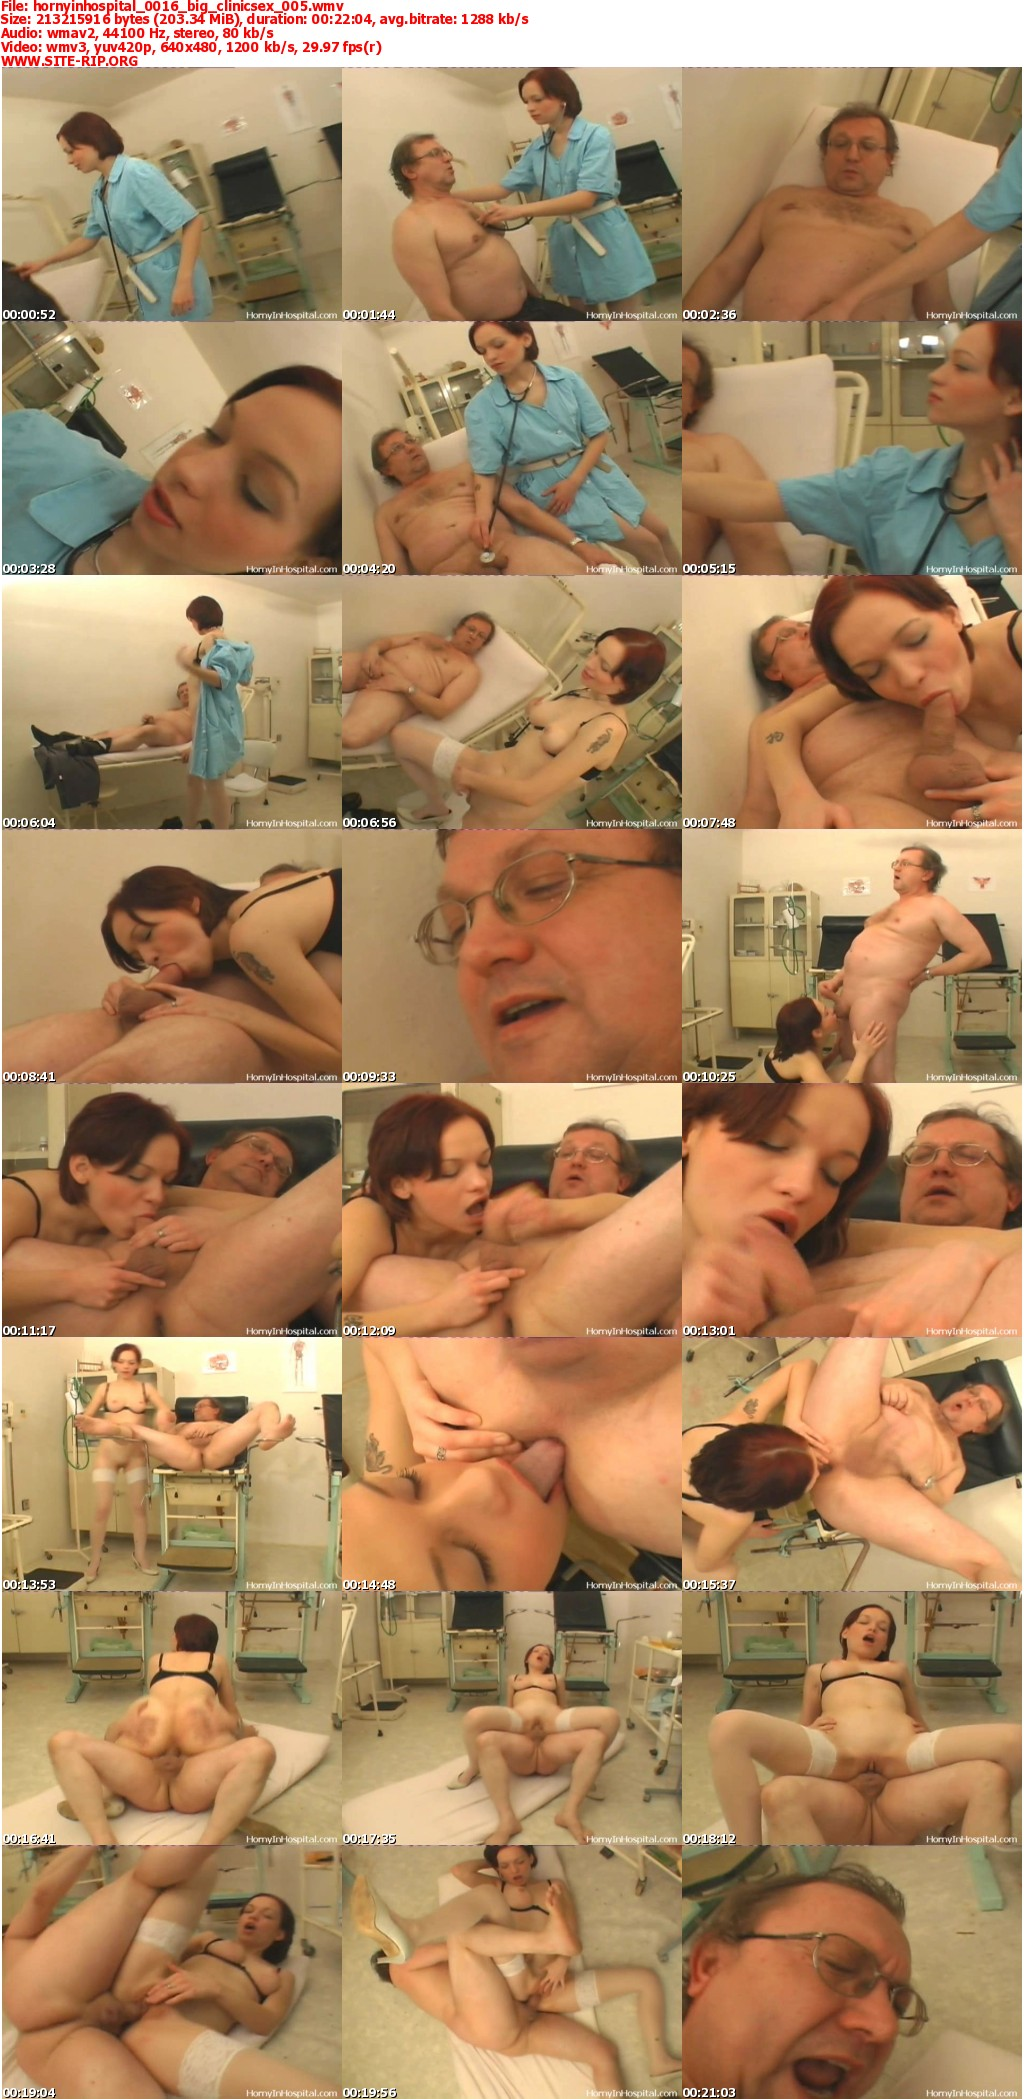 hornyinhospital_0016_big_clinicsex_005_s.jpg